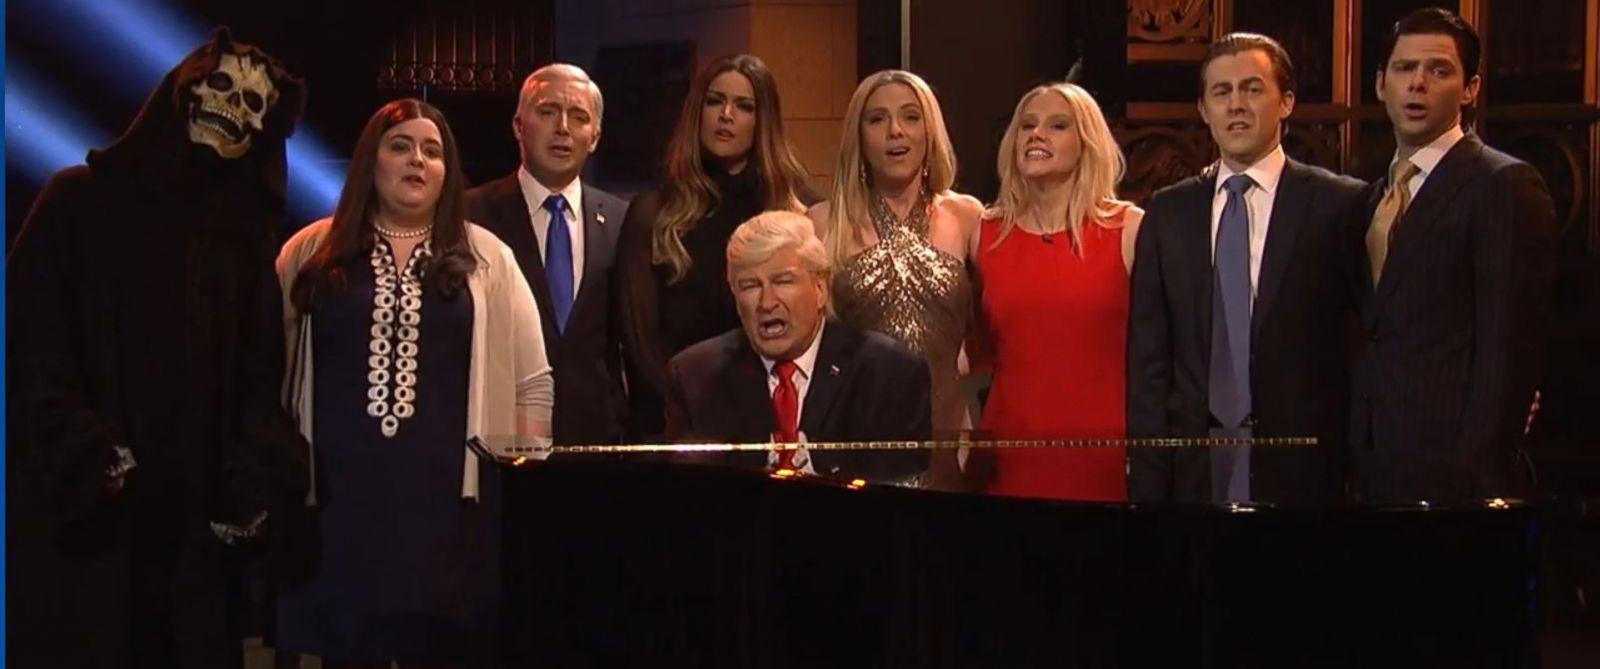 Alec Baldwin, Scarlett Johansson reprise Trump roles on ...